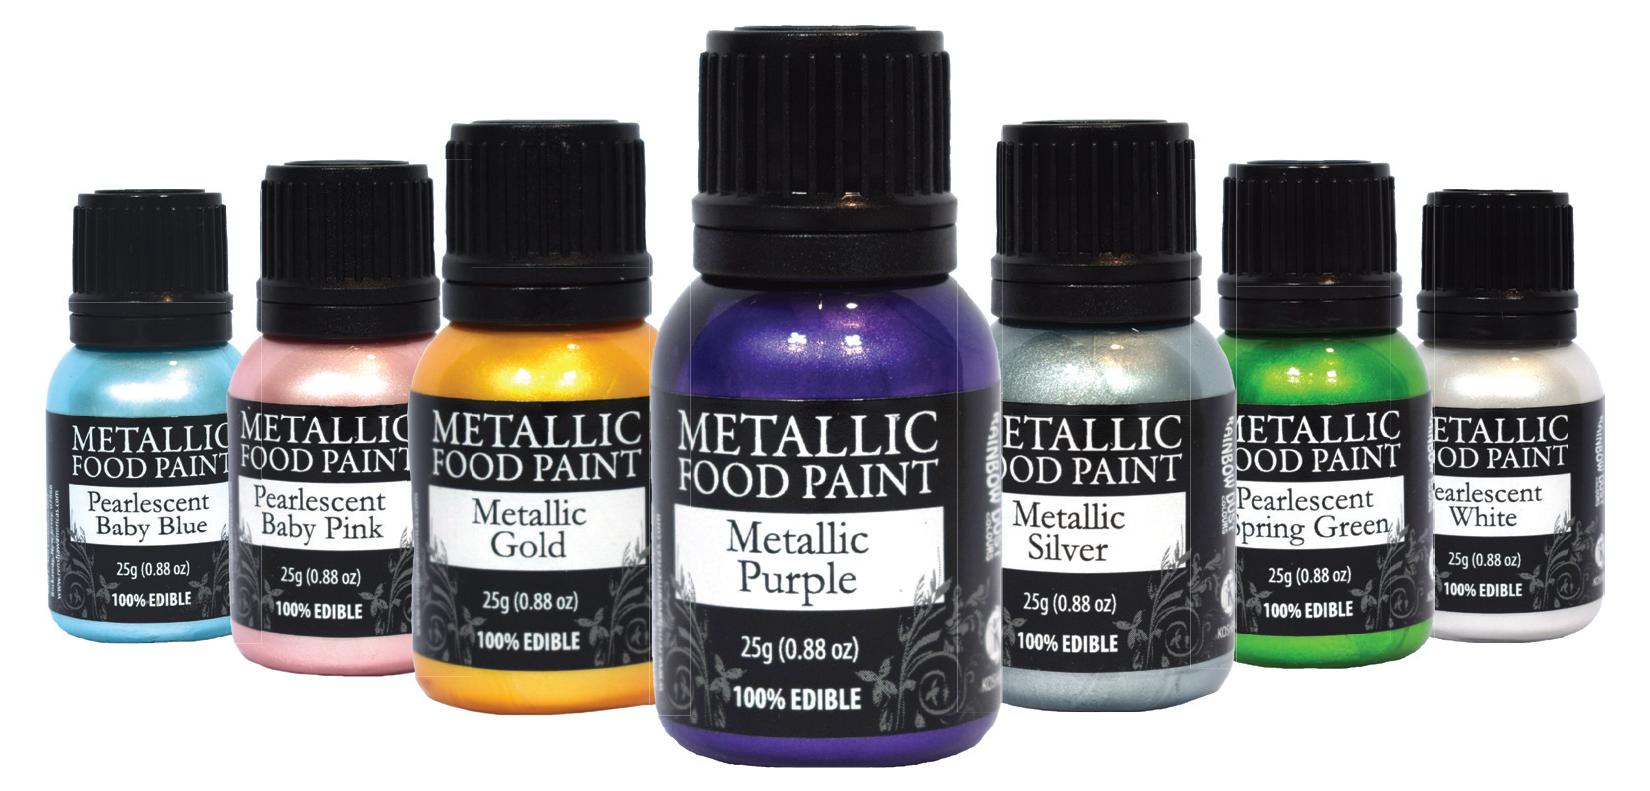 Metallic Food Paints